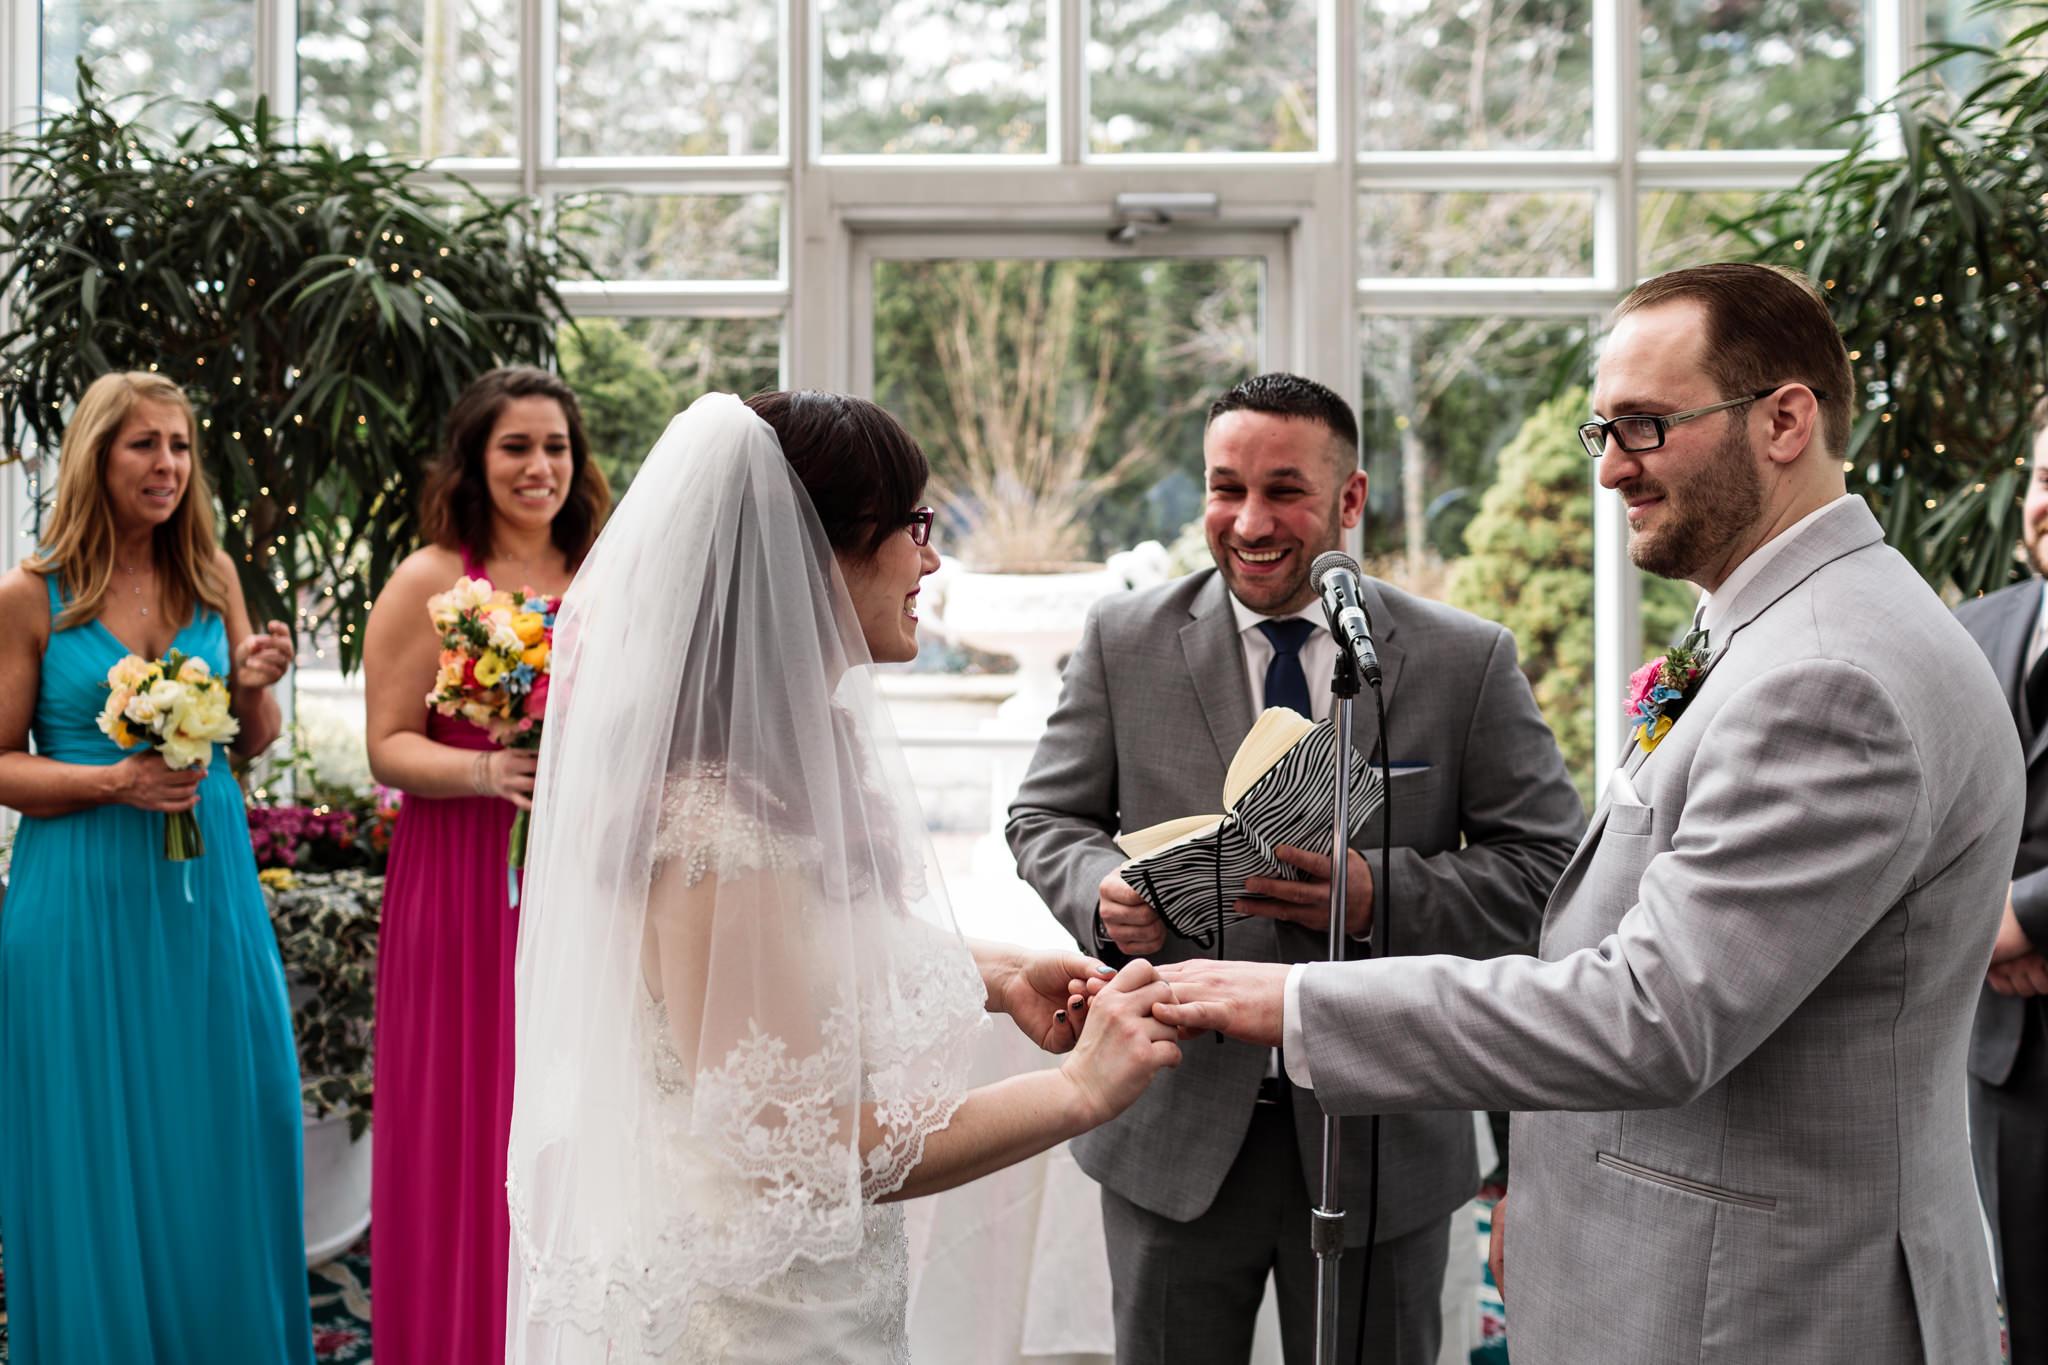 Hanchar_Madison_Hotel_NJ_Wedding_7R5A8289.jpg